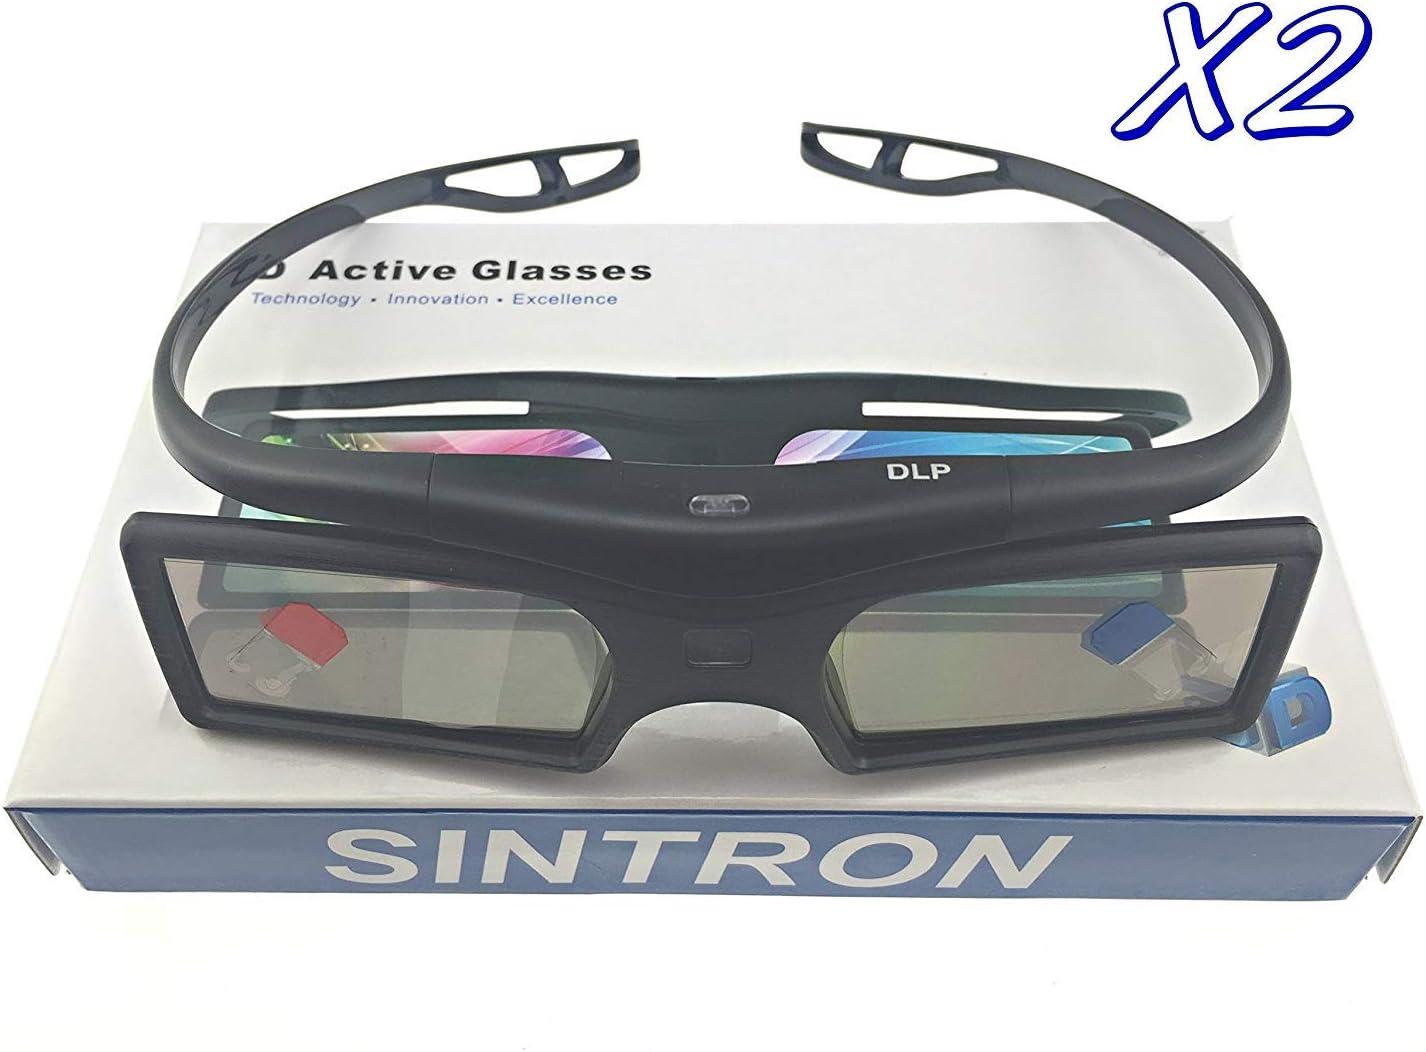 [Sintron] 2X 3D Active DLP-Link Glasses Eyewear - Support All Main Brand, 3D-Ready DLP Projectors Including Optoma, BenQ, Acer, Dell, Viewsonic, Vivitek, Sharp, LG, NEC, Mitsubishi 3D Projectors